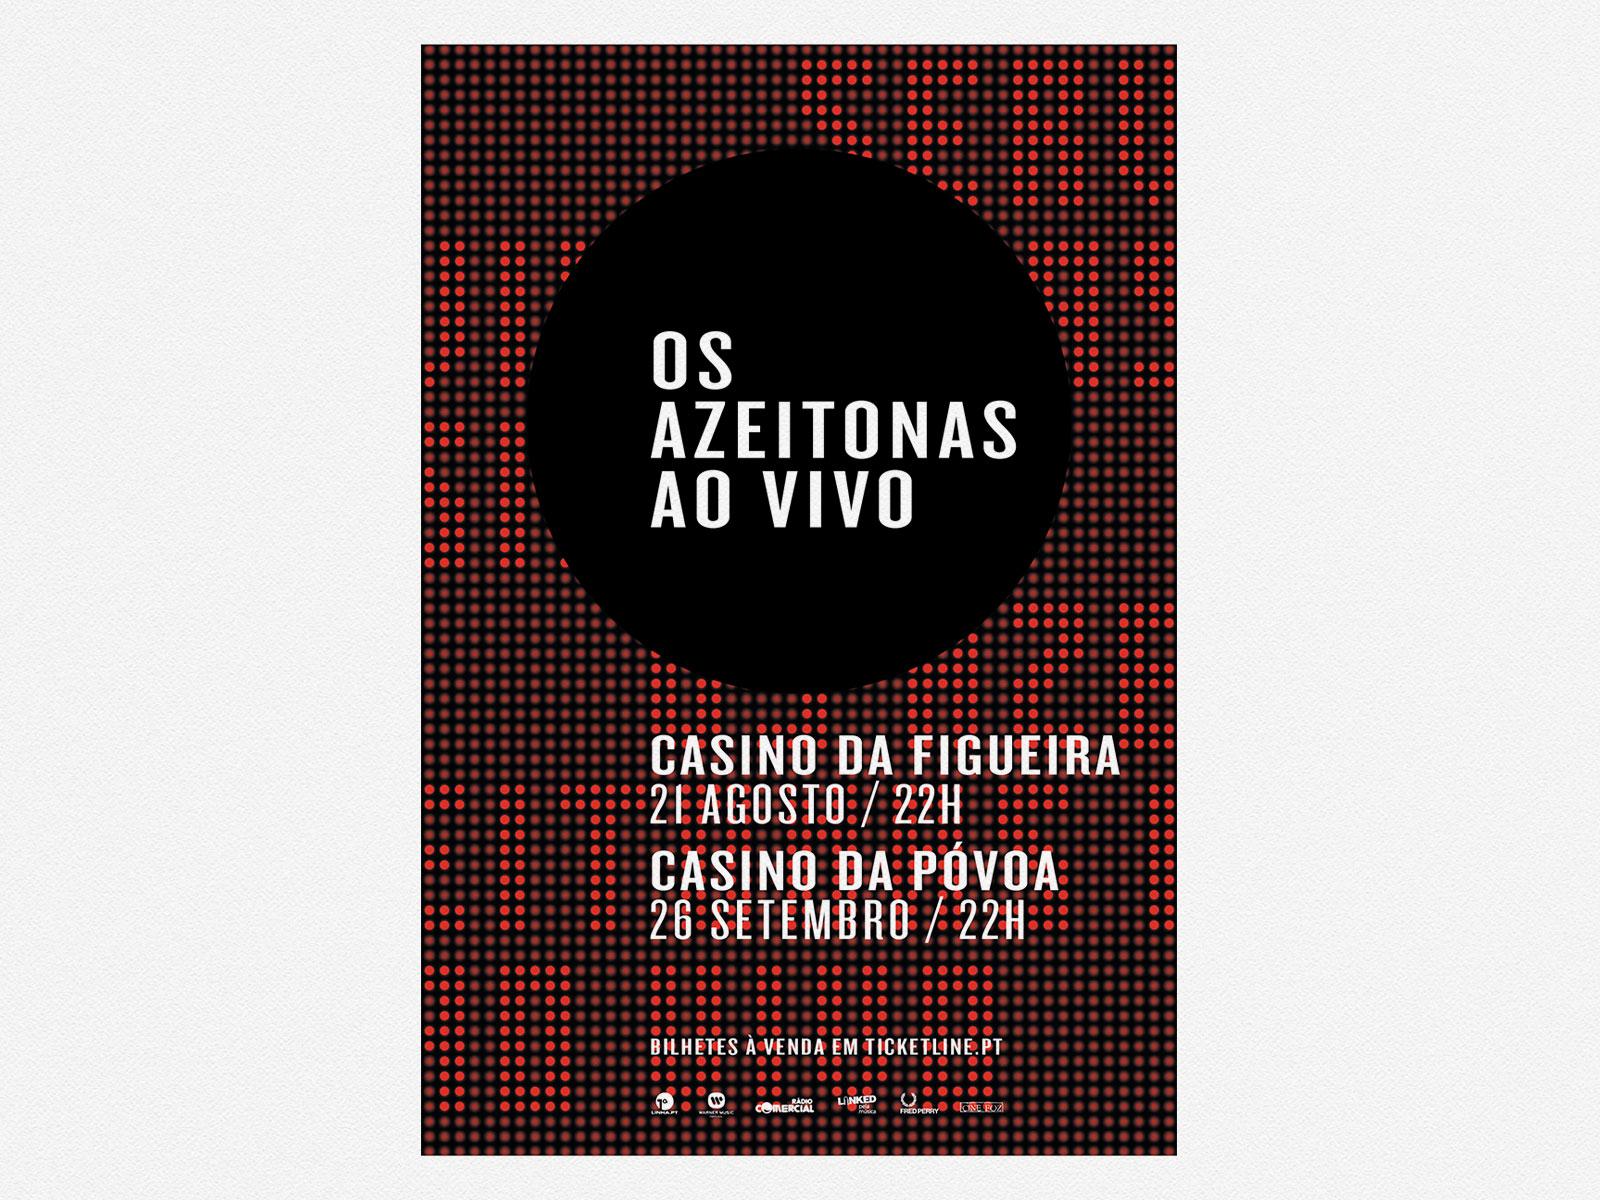 OS AZEITONAS - DVD - 6